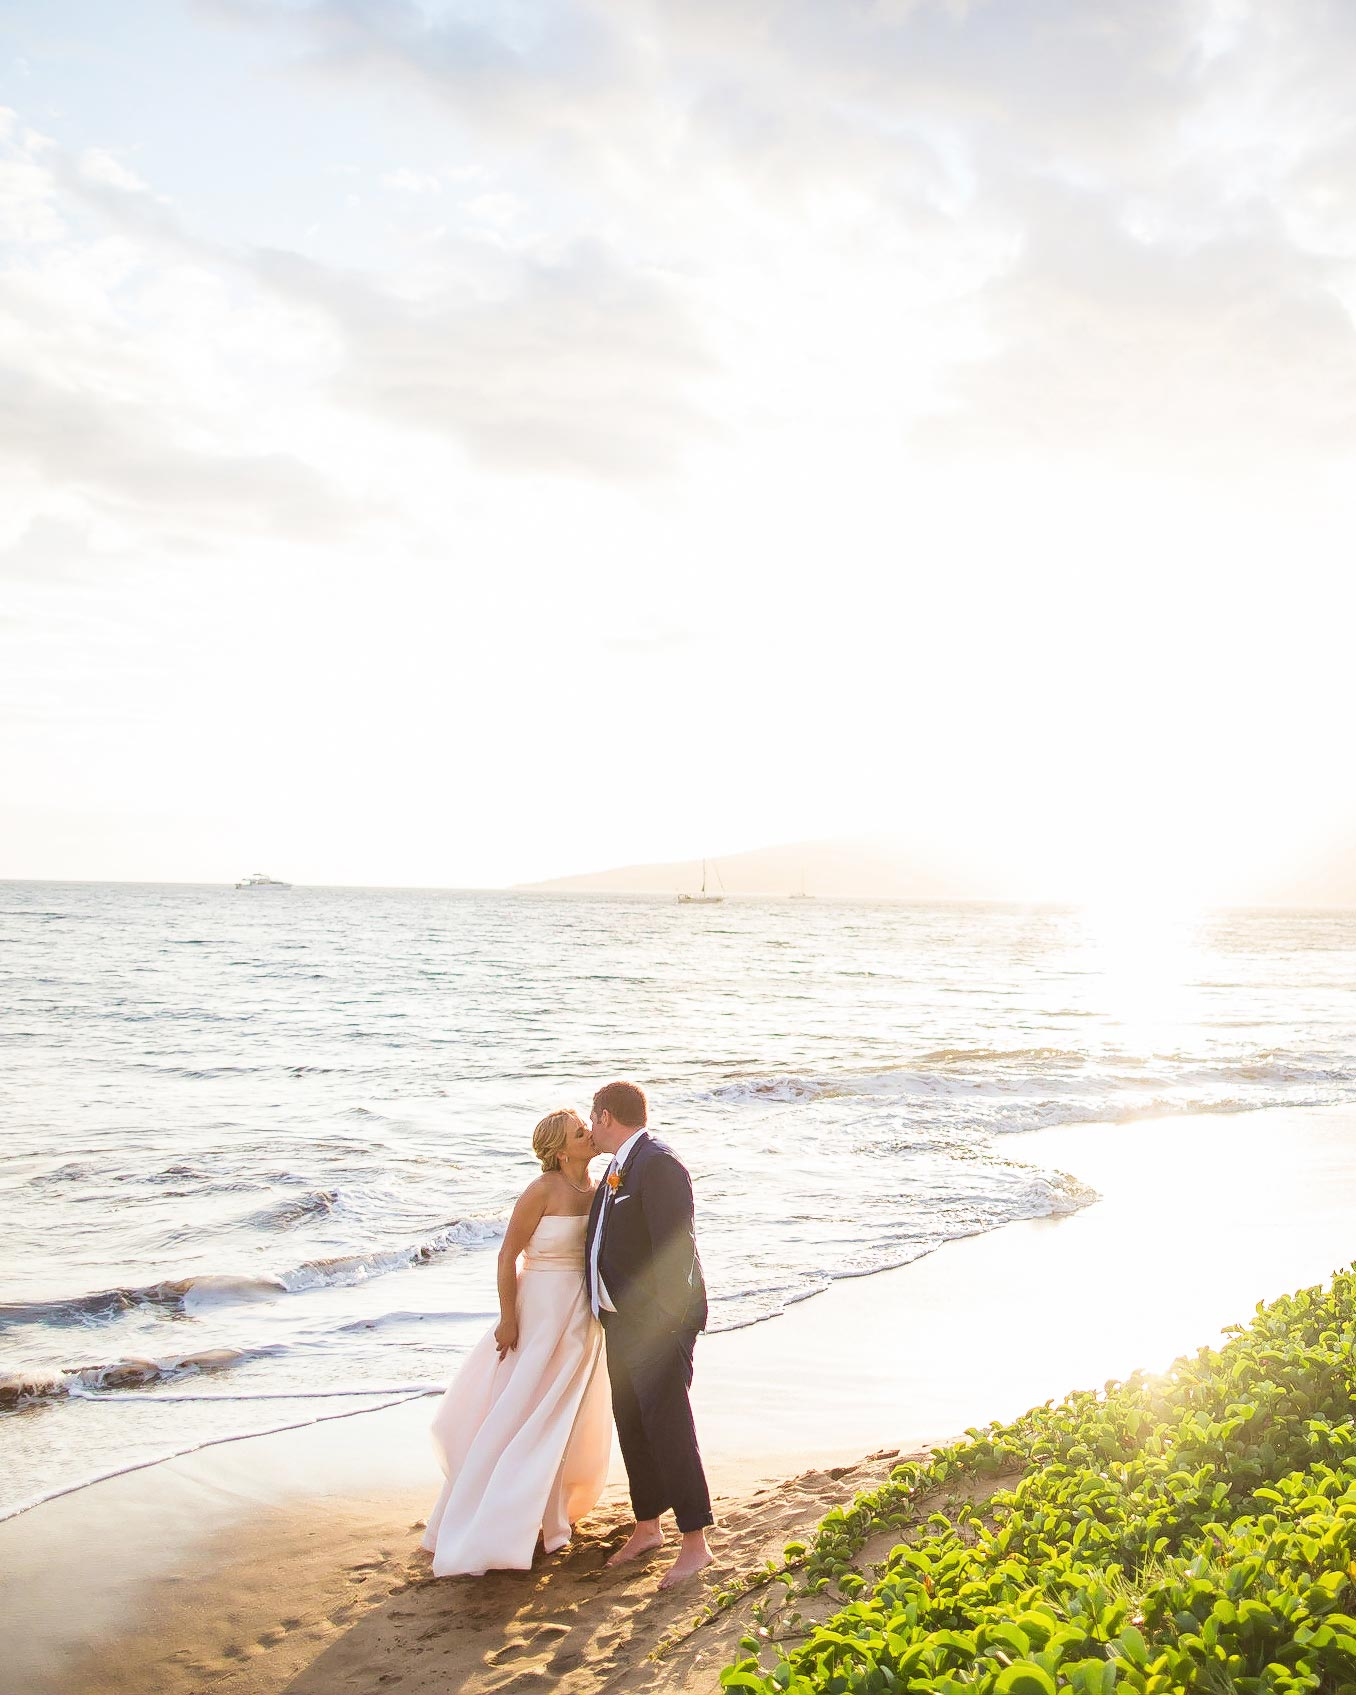 christen-tim-wedding-couple-23437-6143924-0816.jpg